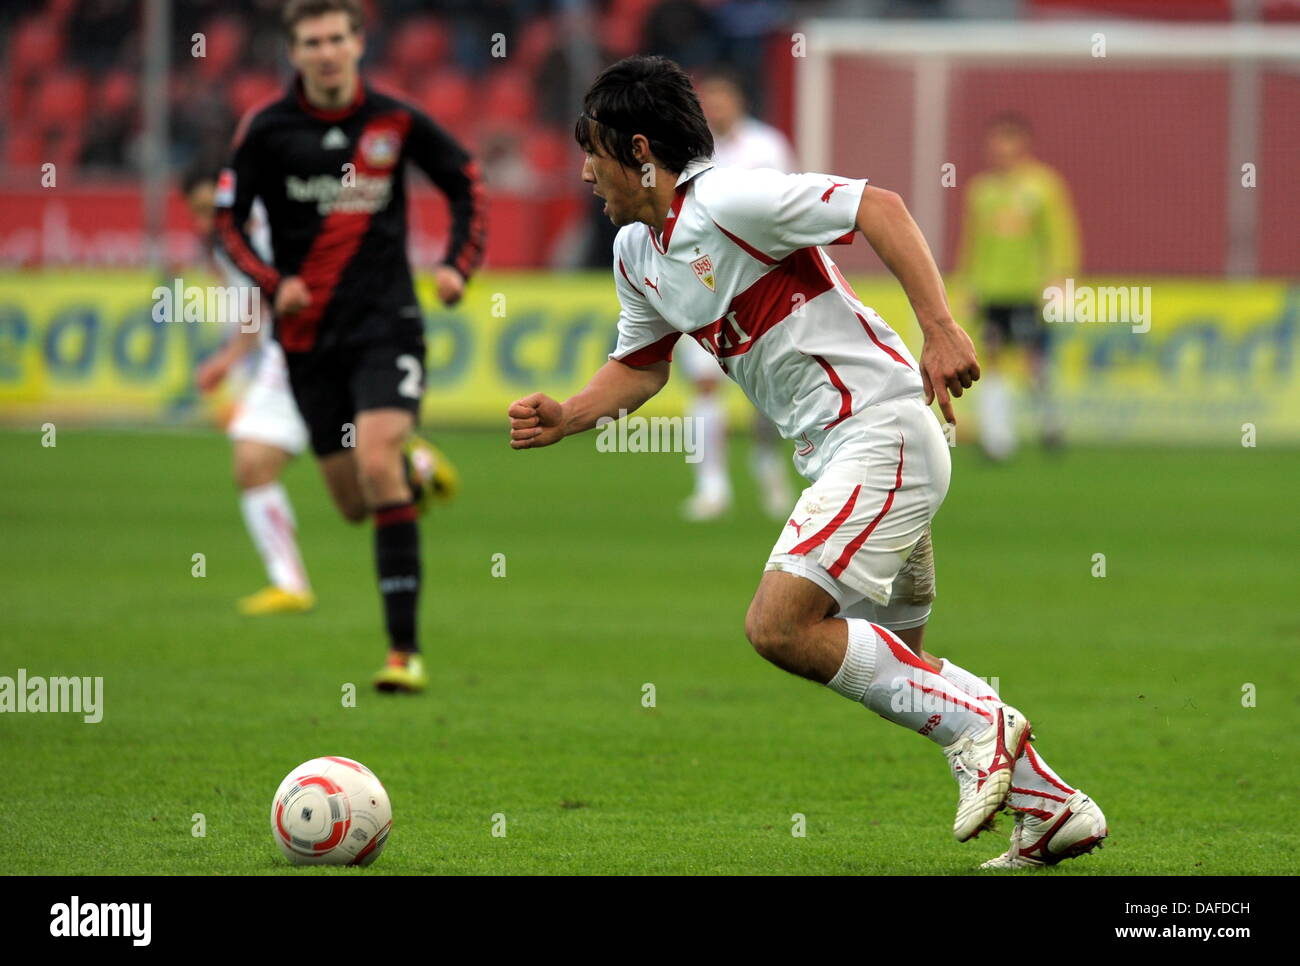 Stuttgart's Shinji Okazaki runs with the ball during the Bundesliga soccer match between Bayer Leverkusen and VfB Stock Photo